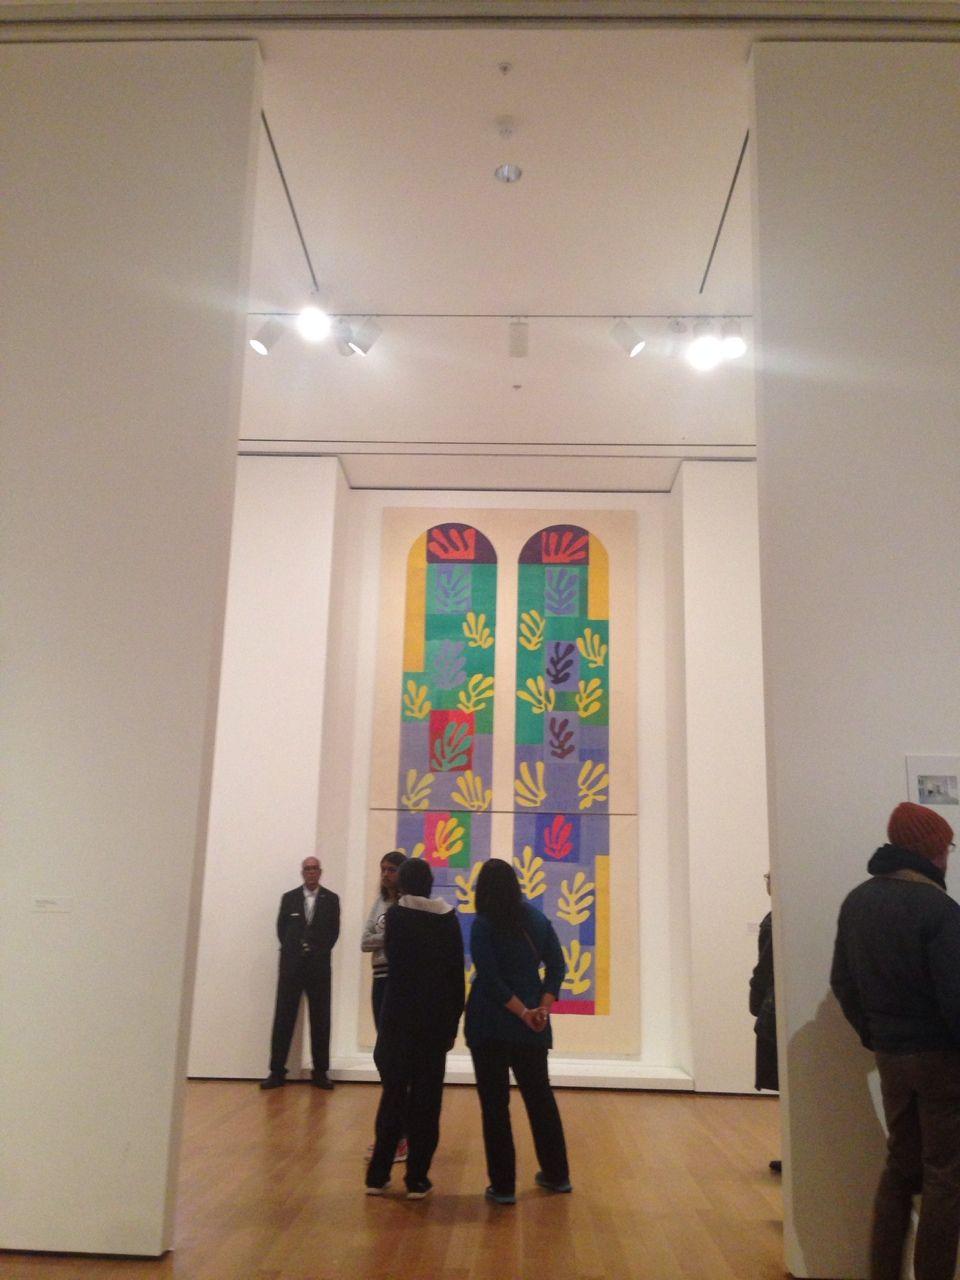 diegoooh:  Henri Matisse, Cut Outs, MOMA